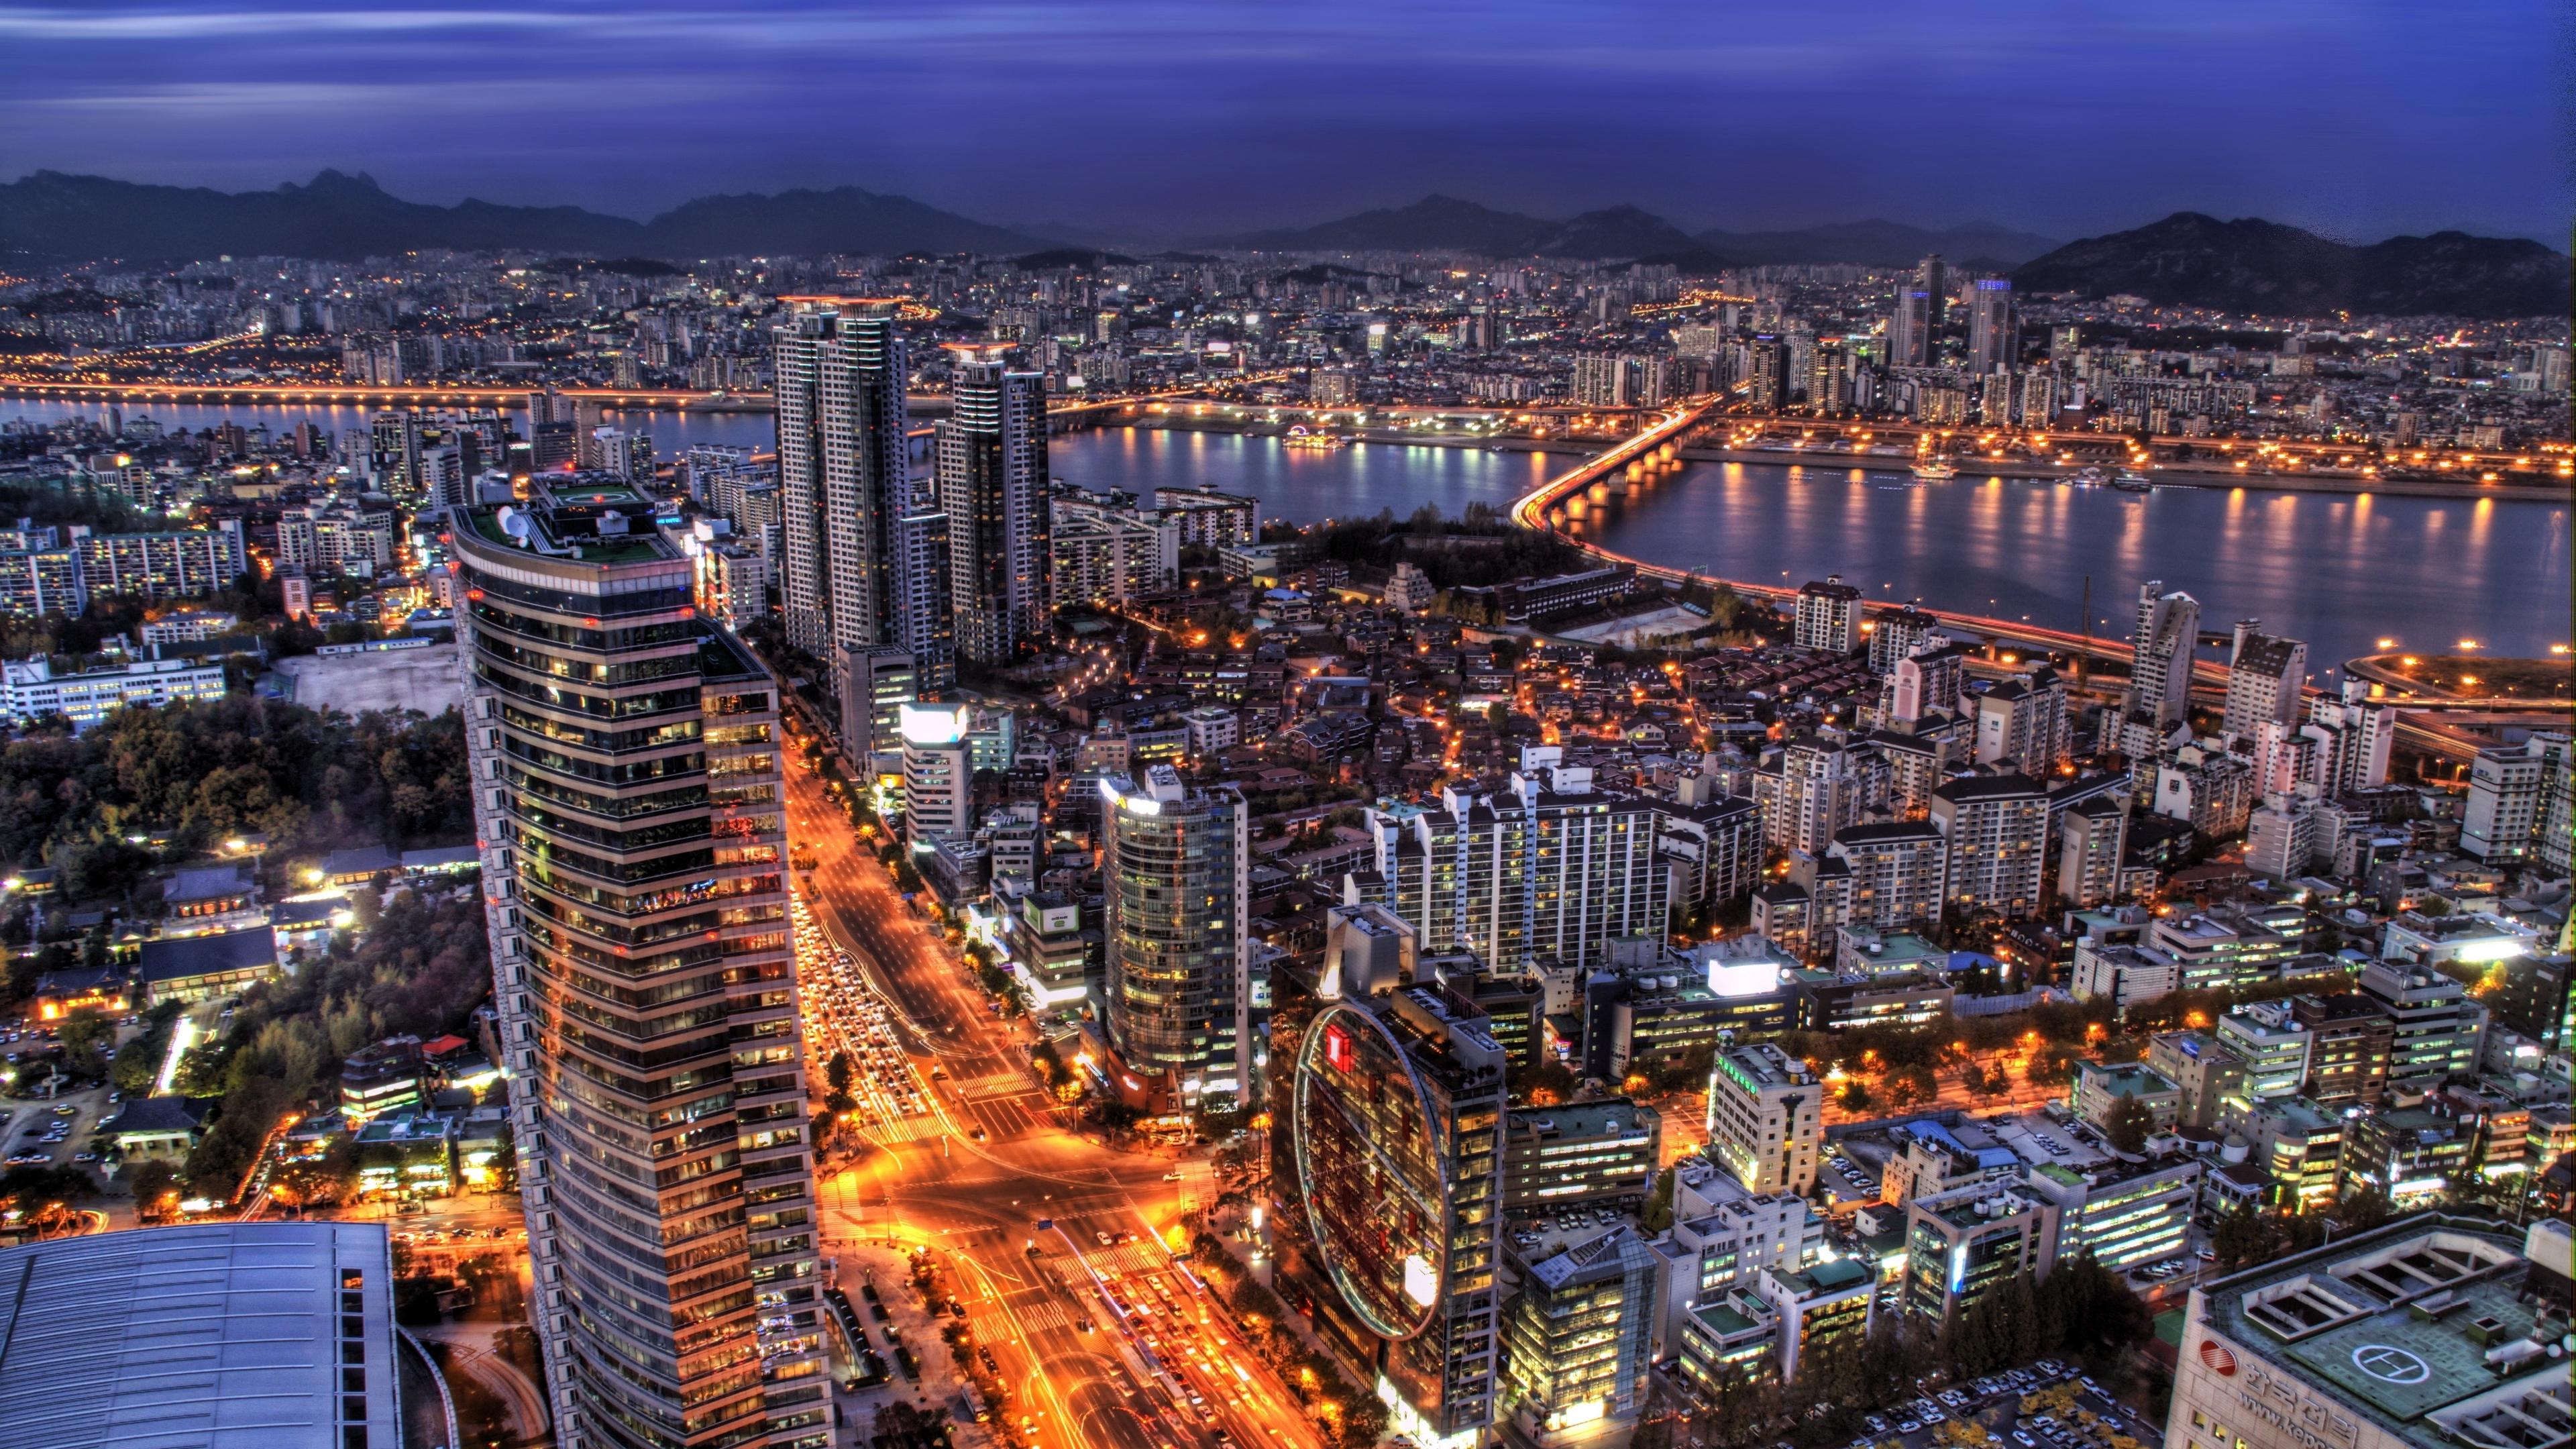 south korea seoul capital city evening skyscrapers lights blue sky hdr 4k 1538068153 - south korea, seoul, capital city, evening, skyscrapers, lights, blue, sky, hdr 4k - south korea, Seoul, capital city